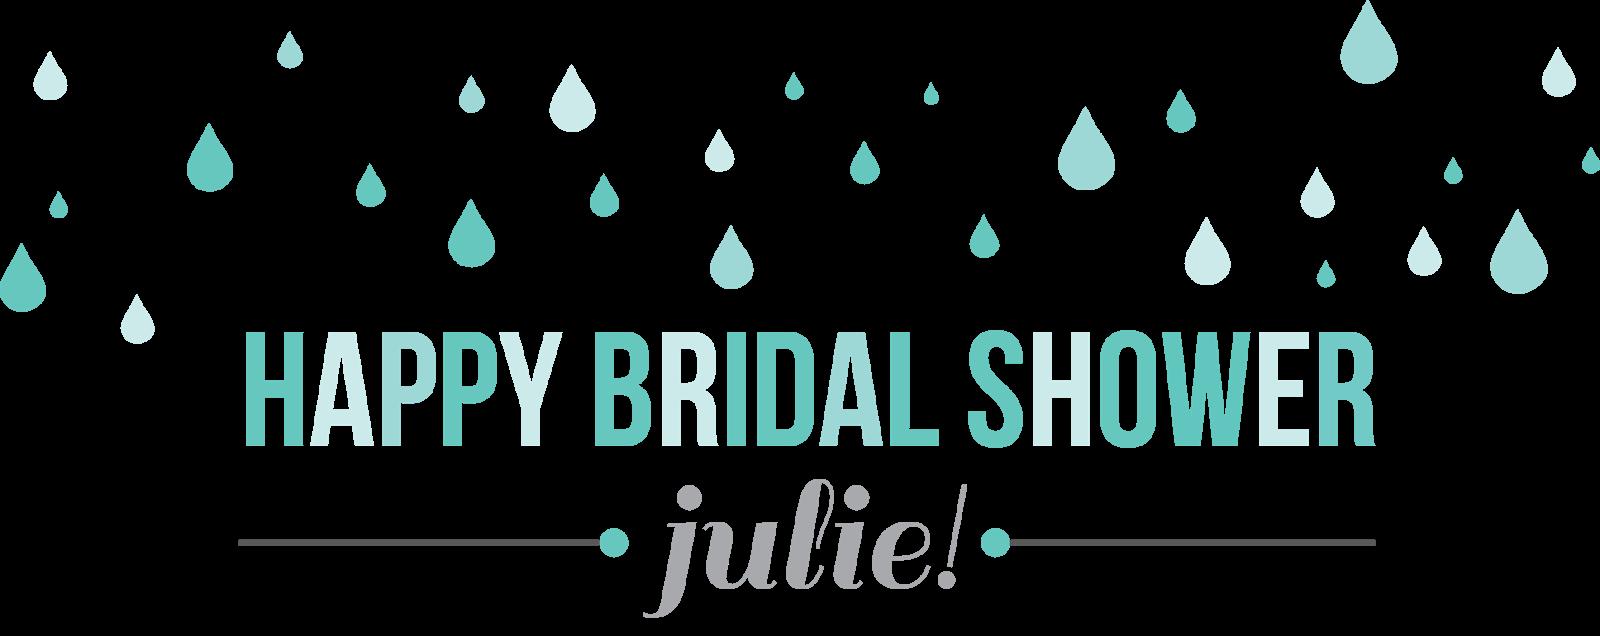 Champagne Mojitos A Virtual Bridal Shower